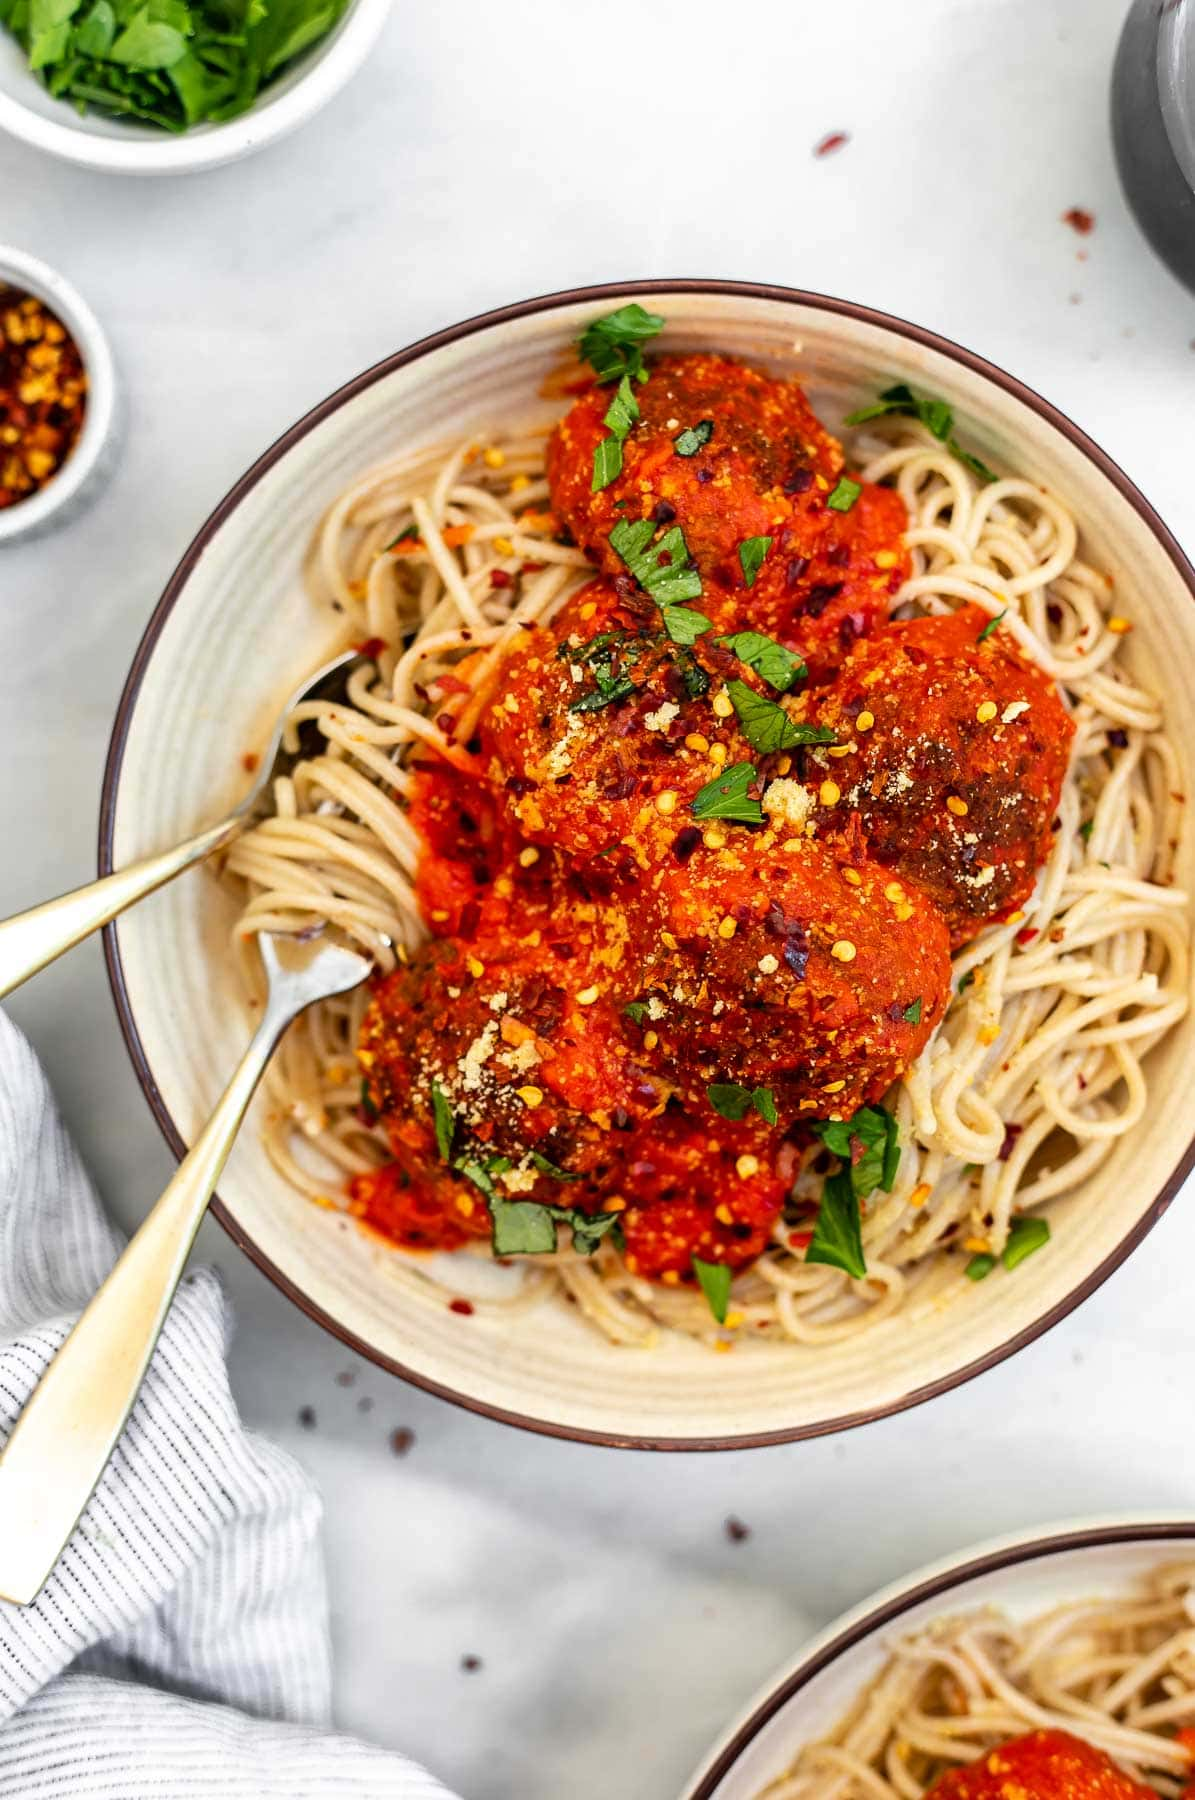 Vegan lentil meatballs with marinara sauce served over spaghetti.